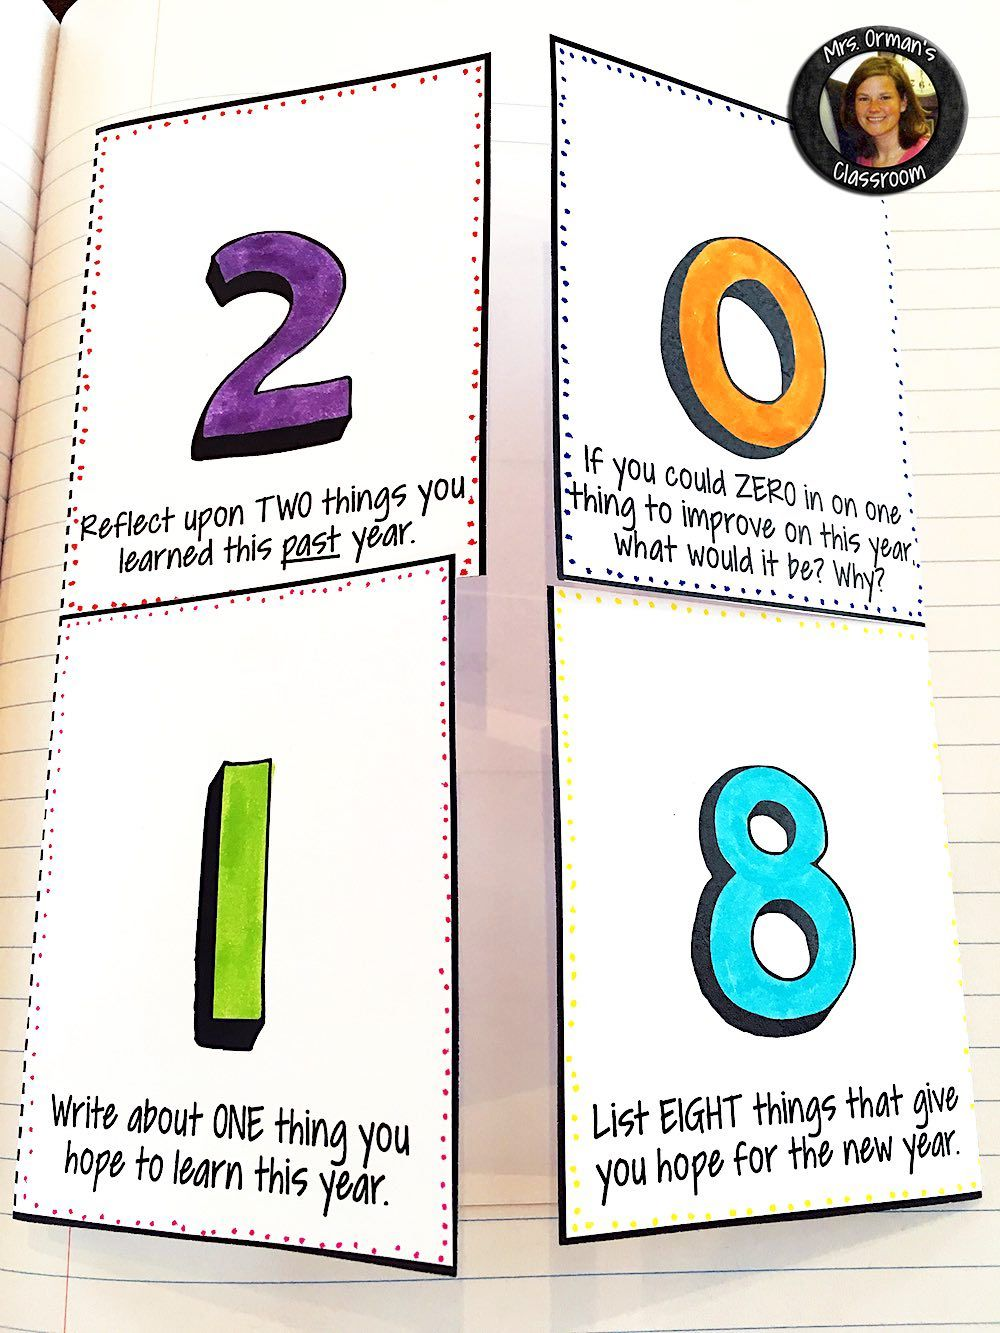 New Year Activities 2020 Resolution Goals Creative Growth Mindset New Years Activities English Teacher High School Middle School Literacy